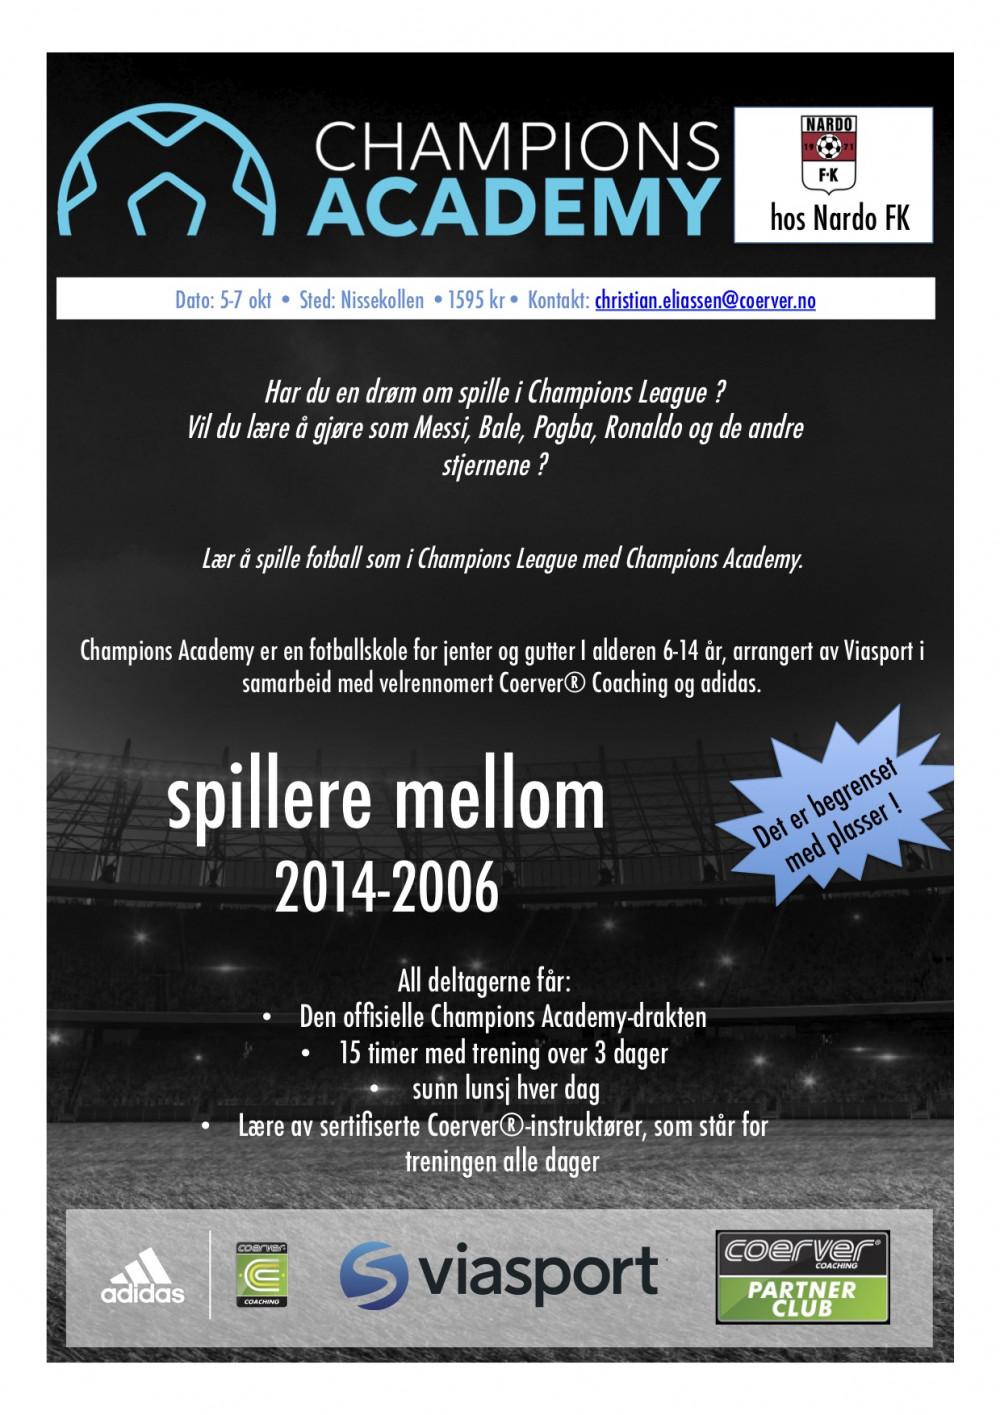 Champions Academy hos Nardo FK 2020